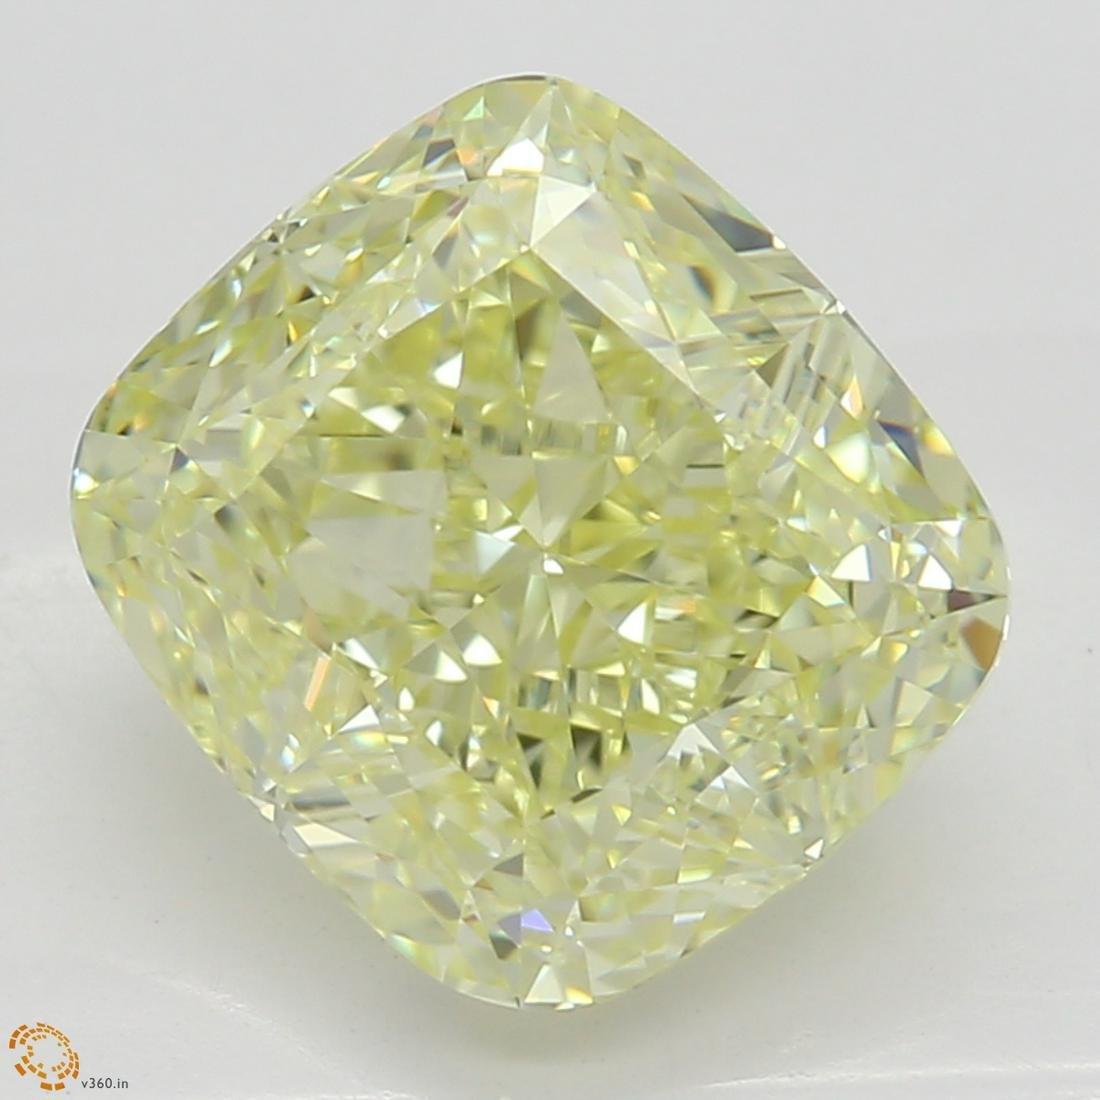 2.53 ct, Lt. Yellow/IF, Cushion cut Diamond